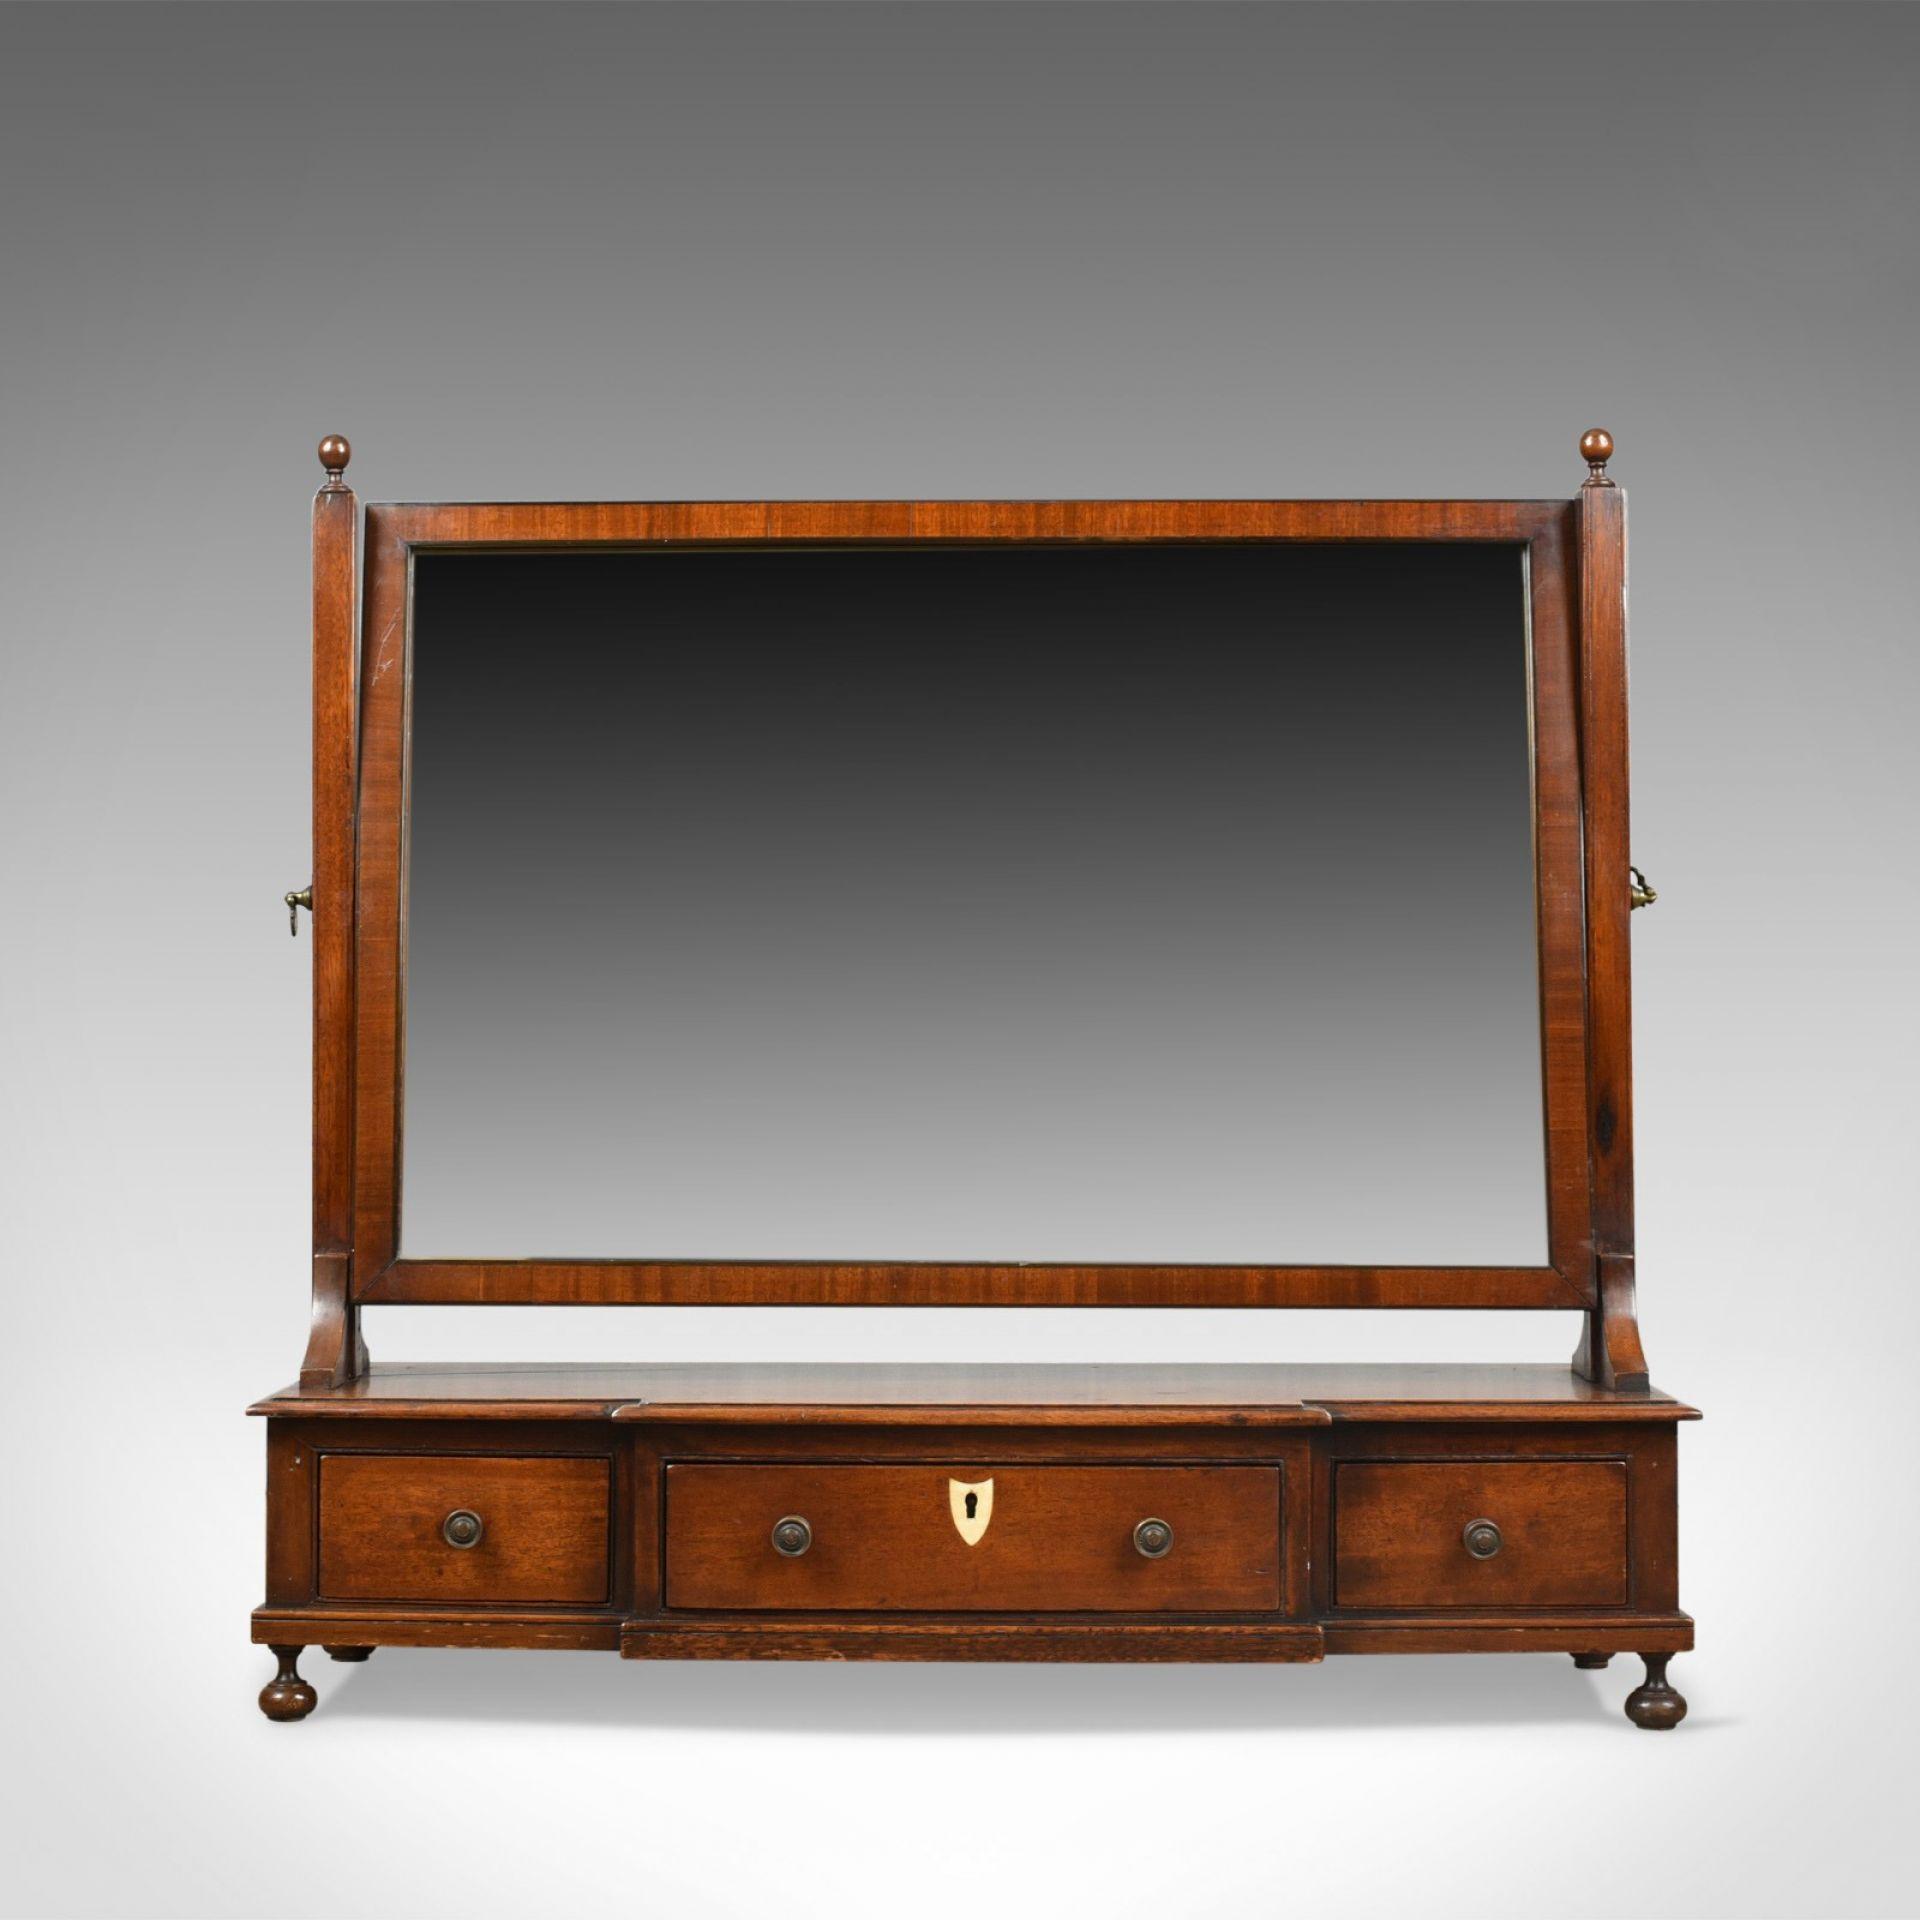 Large, Antique Dressing Table Mirror, Mahogany, Georgian, Platform, Toilet C1800